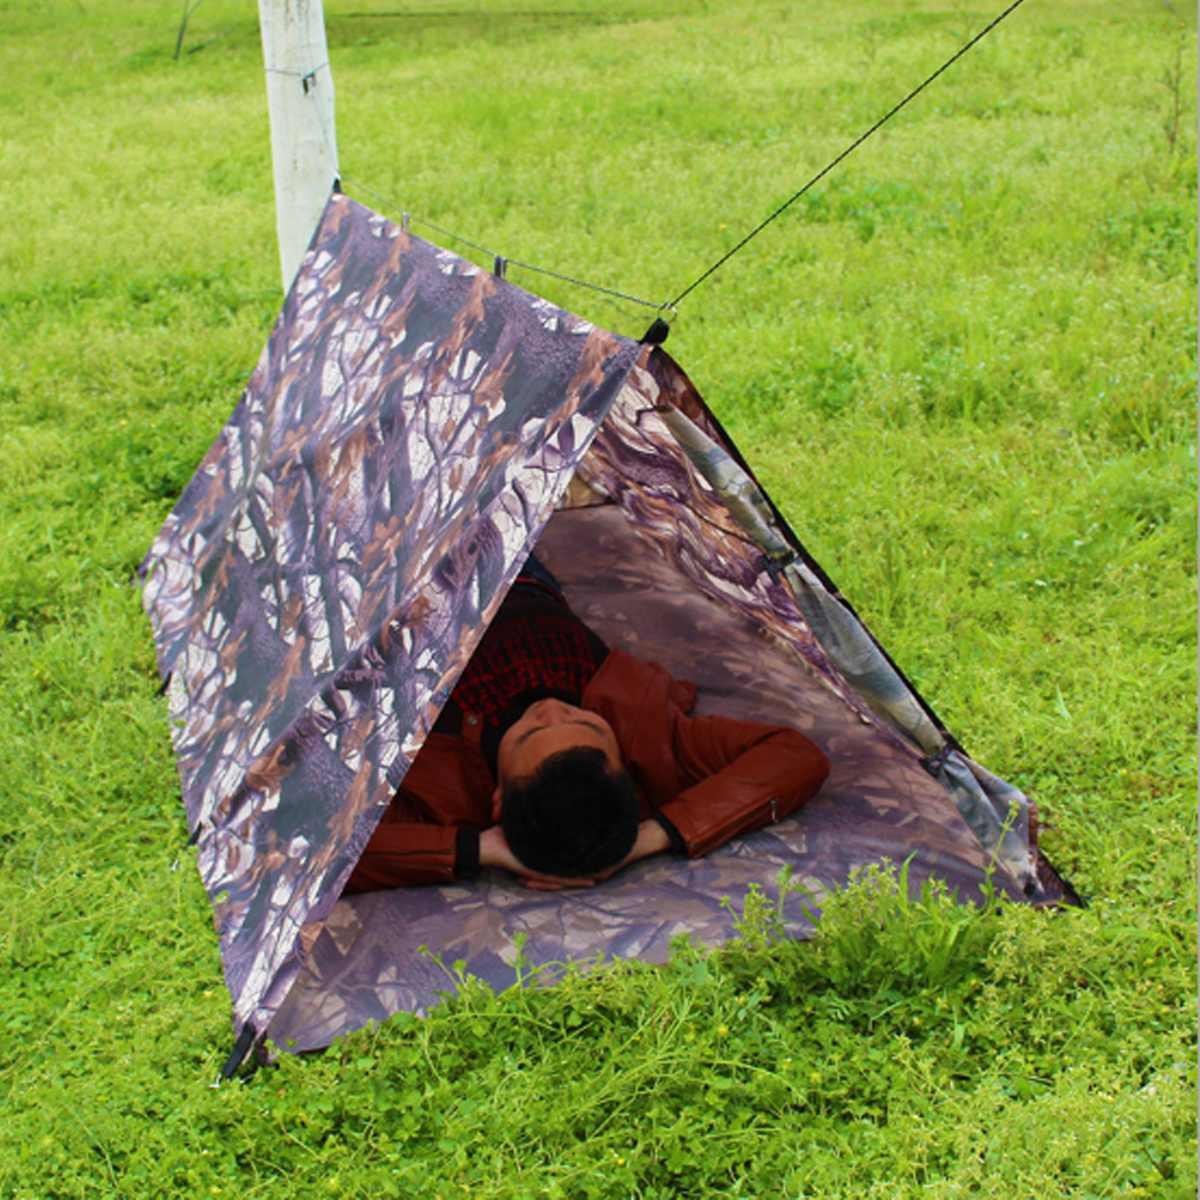 Outdoor Portable Kepeak Tent Tarp Camping Tent Awning Sun Shade Rain Shelter